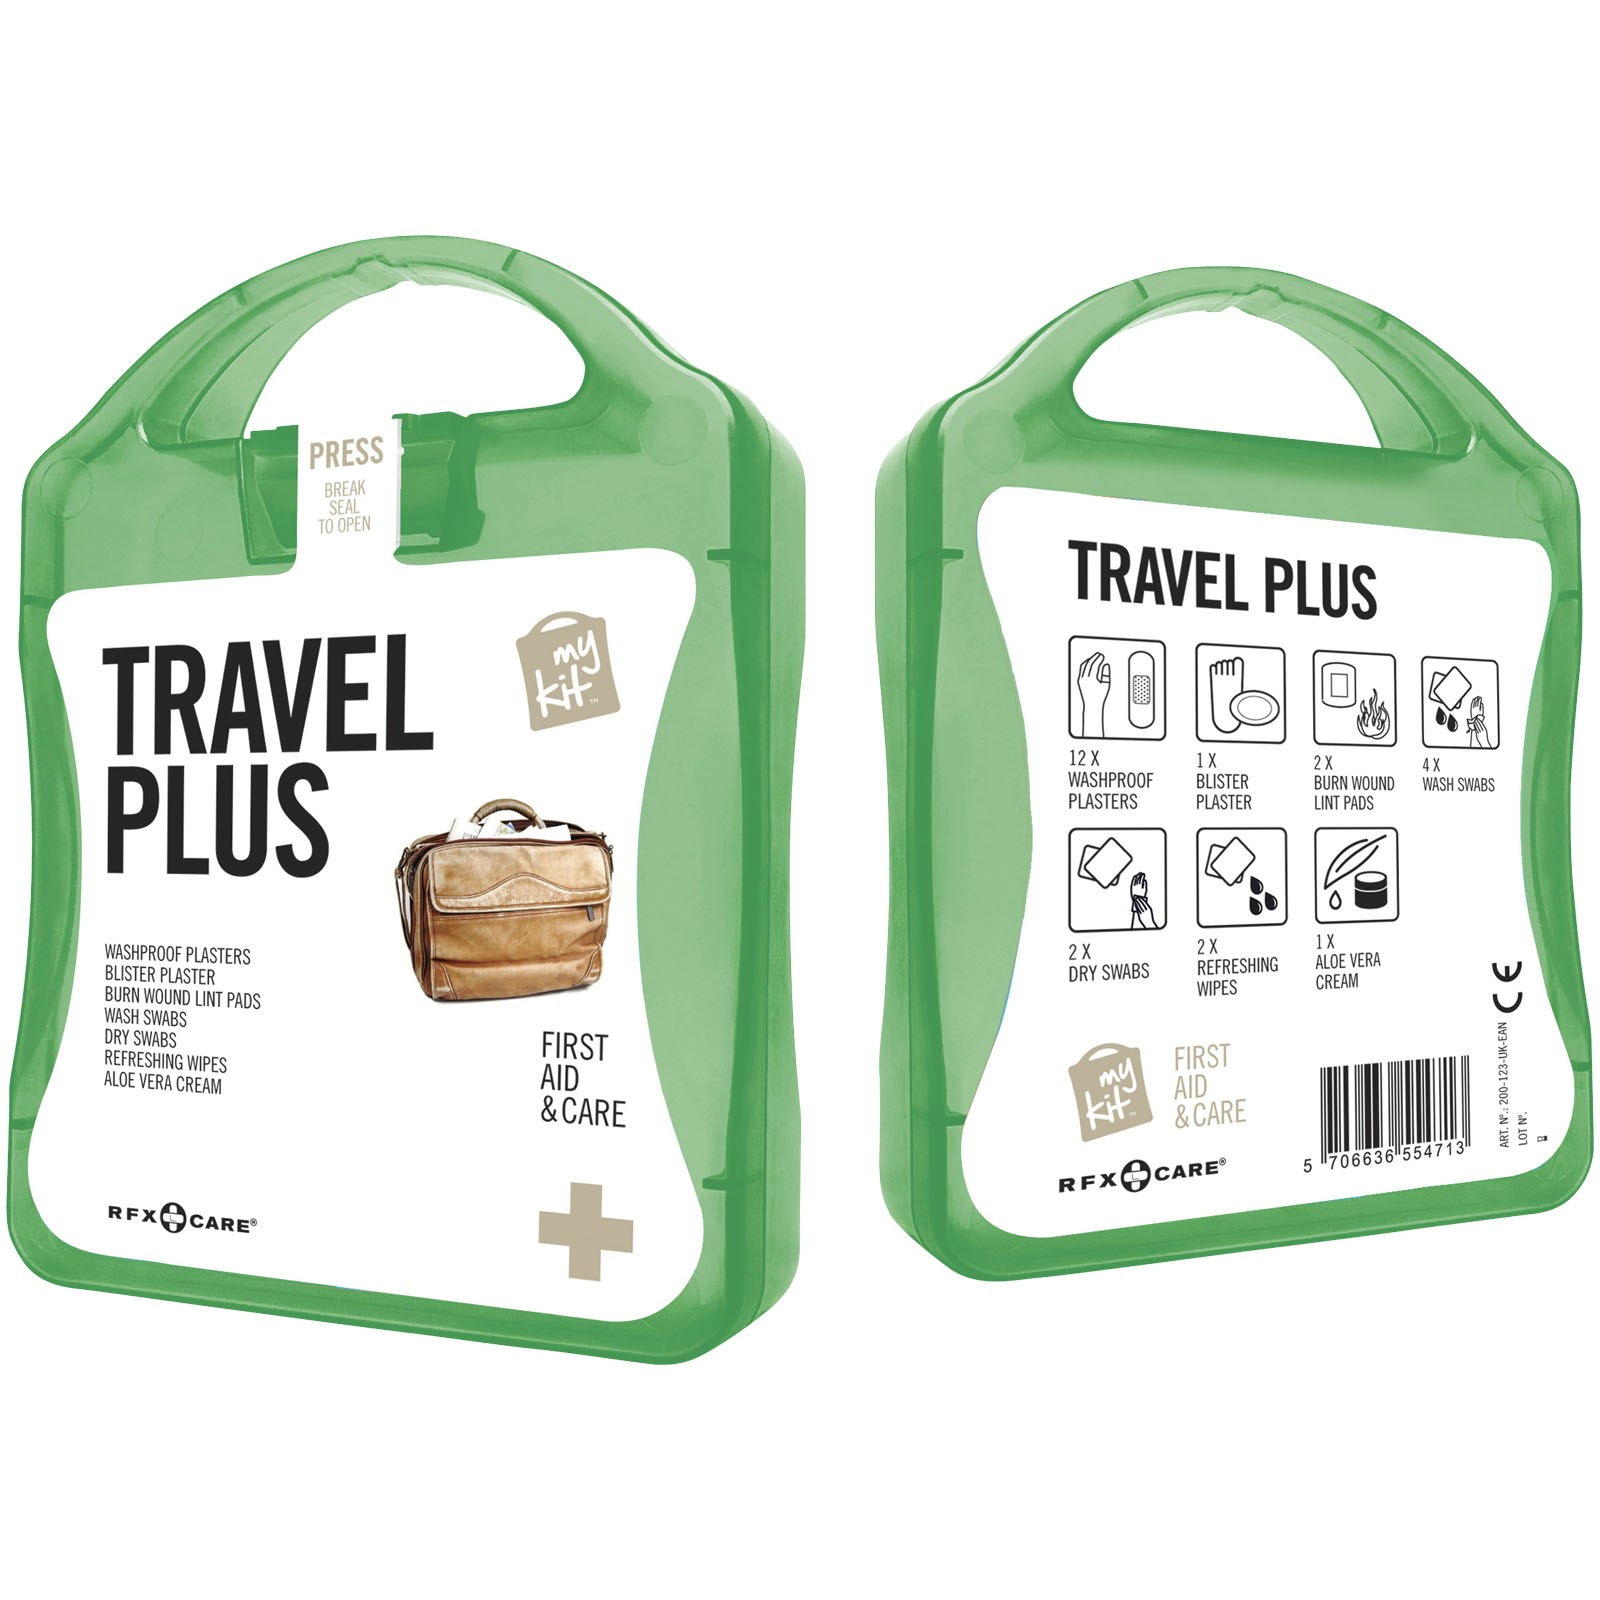 MyKit Travel Plus First Aid Kit - Green